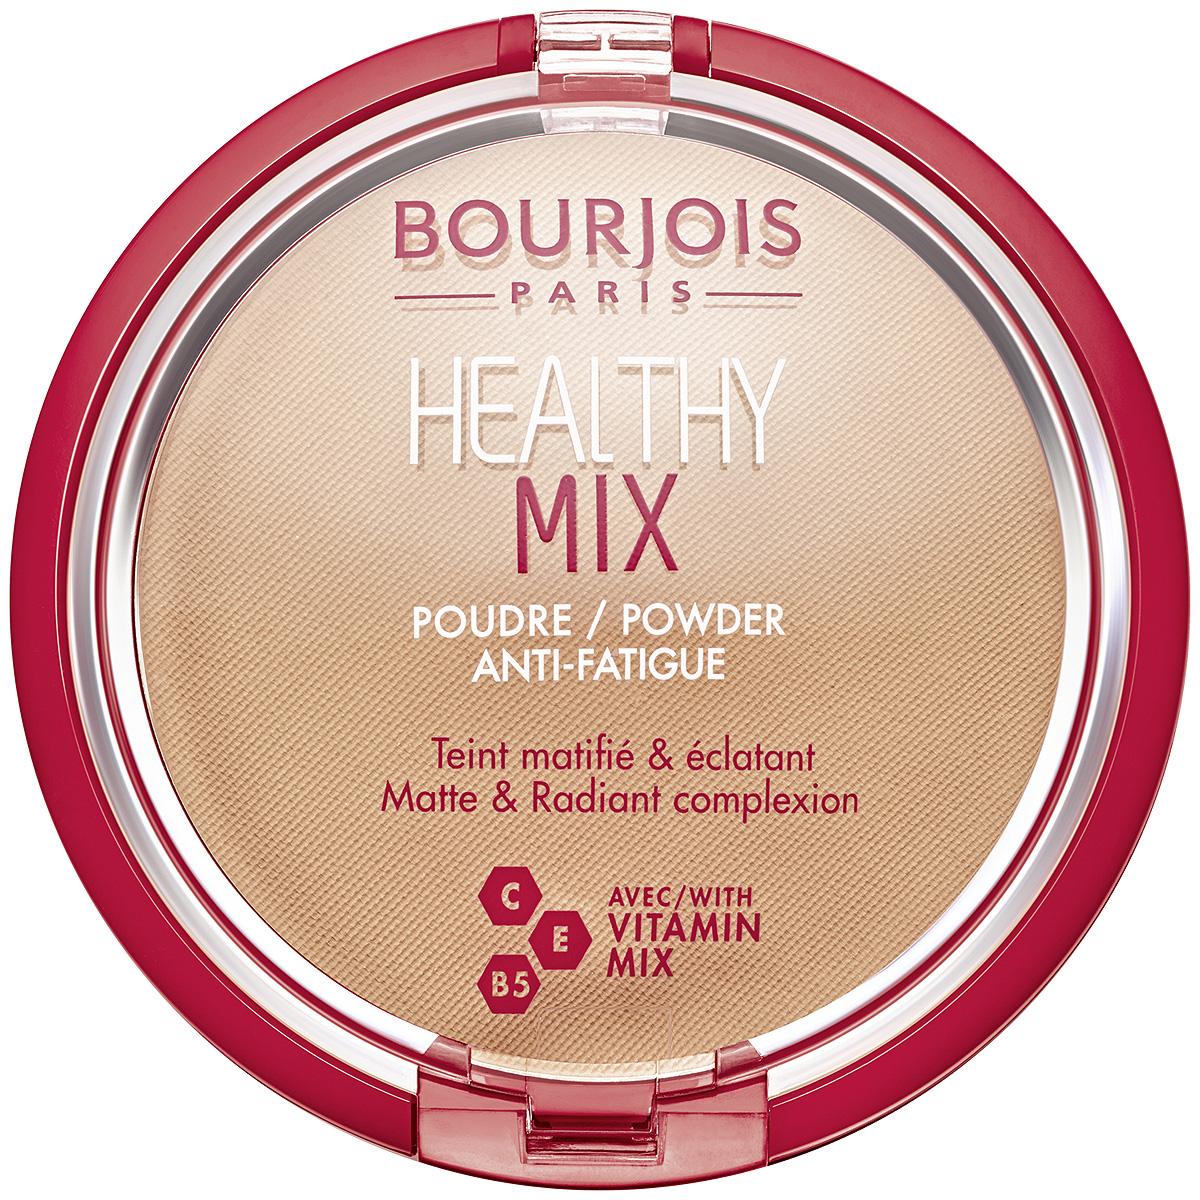 Bourjois Пудра Healthy Mix Тон №4, 11 г